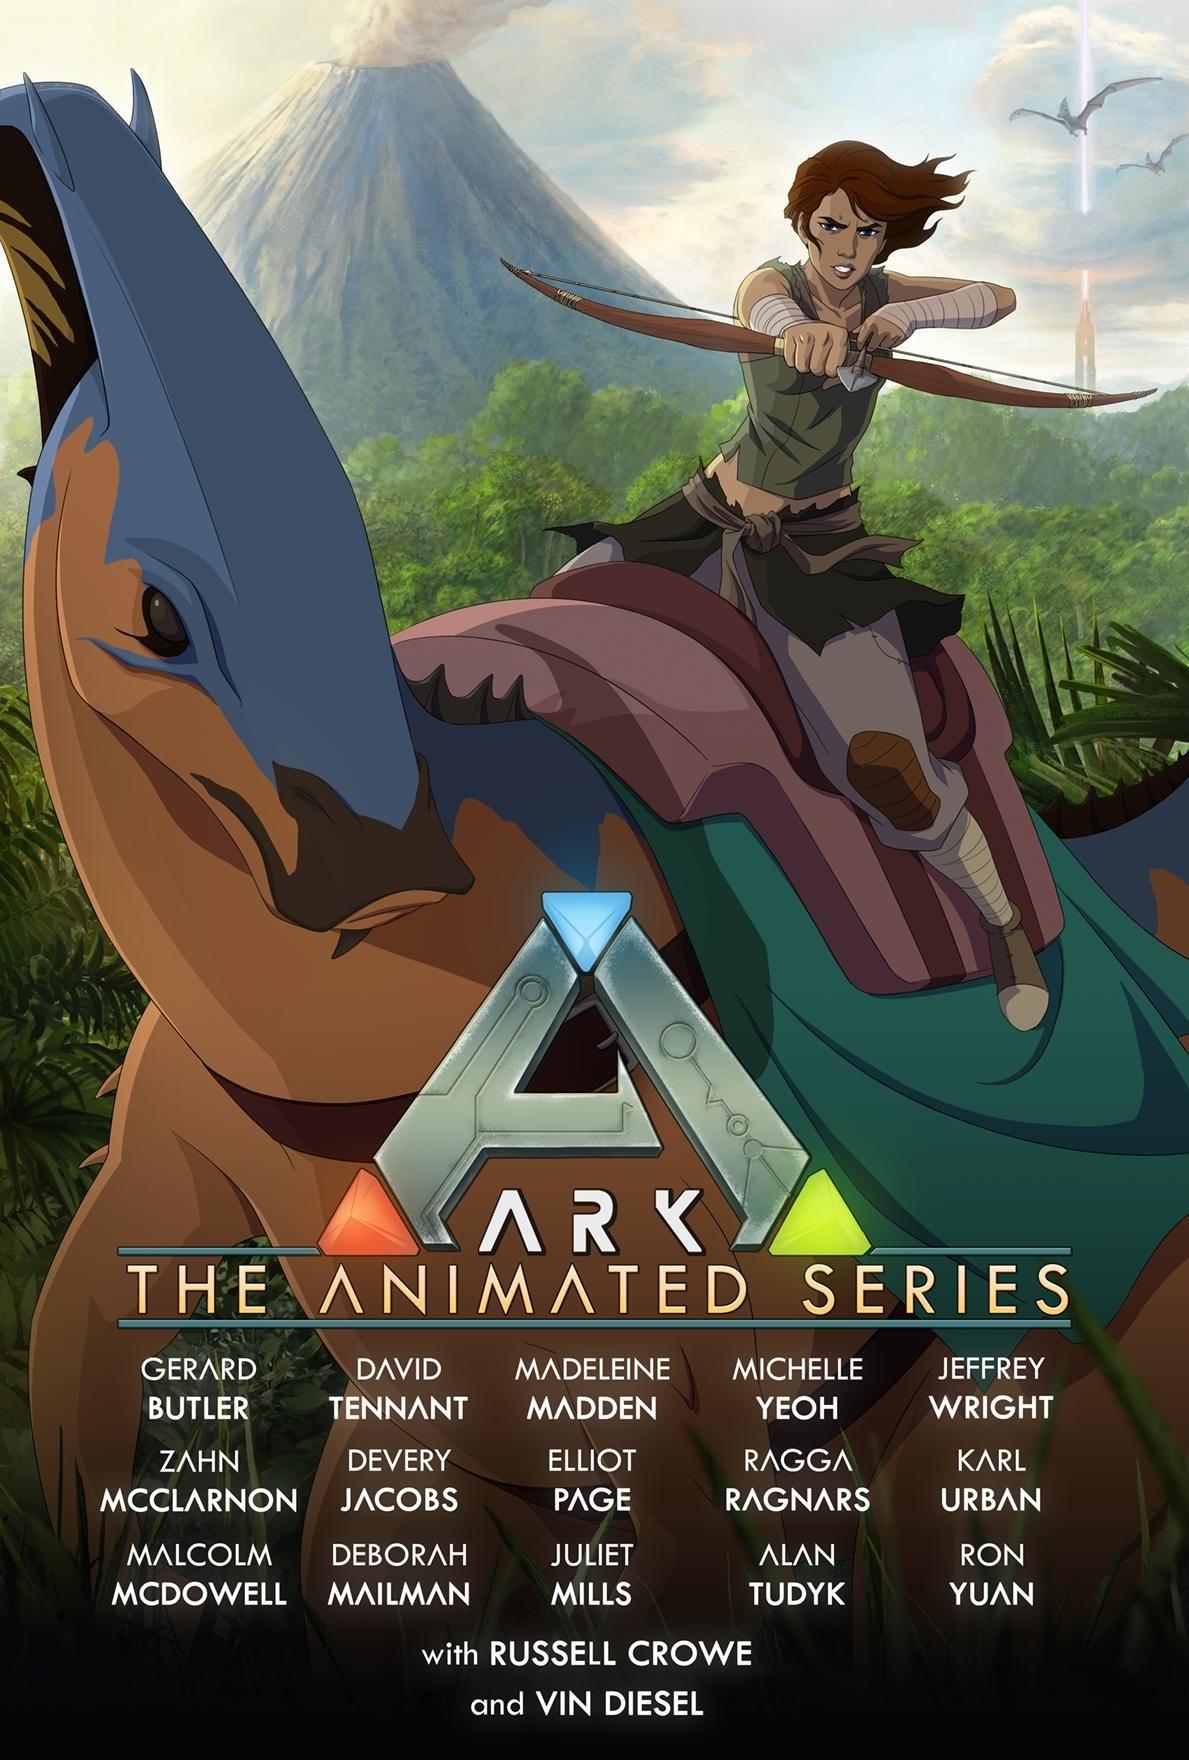 ark the animated series do studio wildcard - ARK: The Animated Series do Studio Wildcard com Vin Diesel e Karl Urban